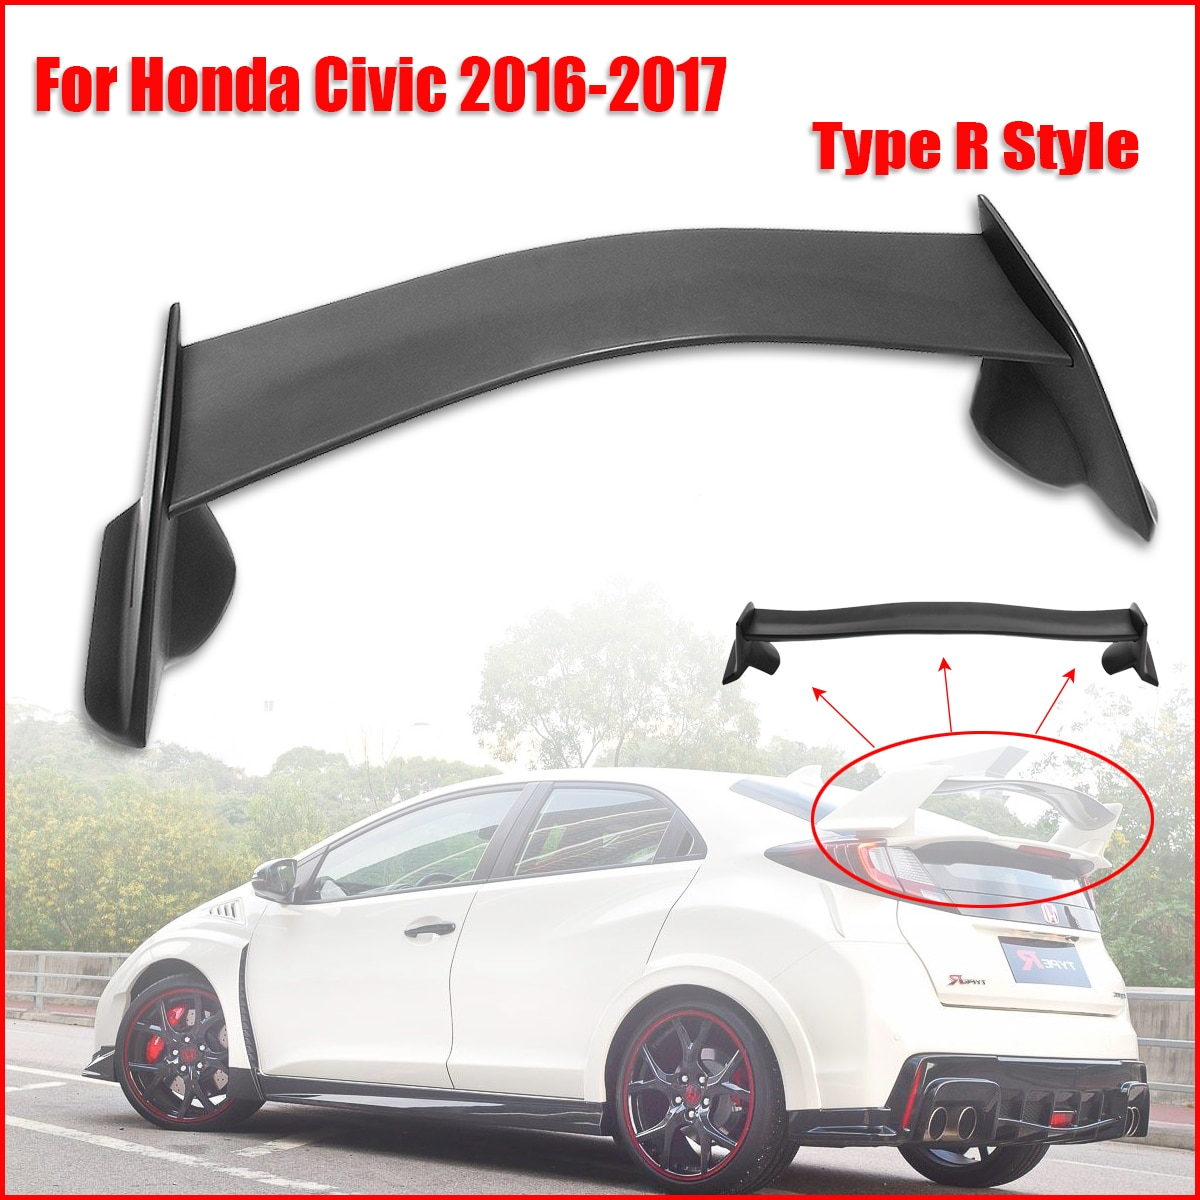 Kit de carrocería Tipo R para Honda 16-Up Ci vic Cou pe 2Dr ABS gran actualización Auto Refit Spoilers negros